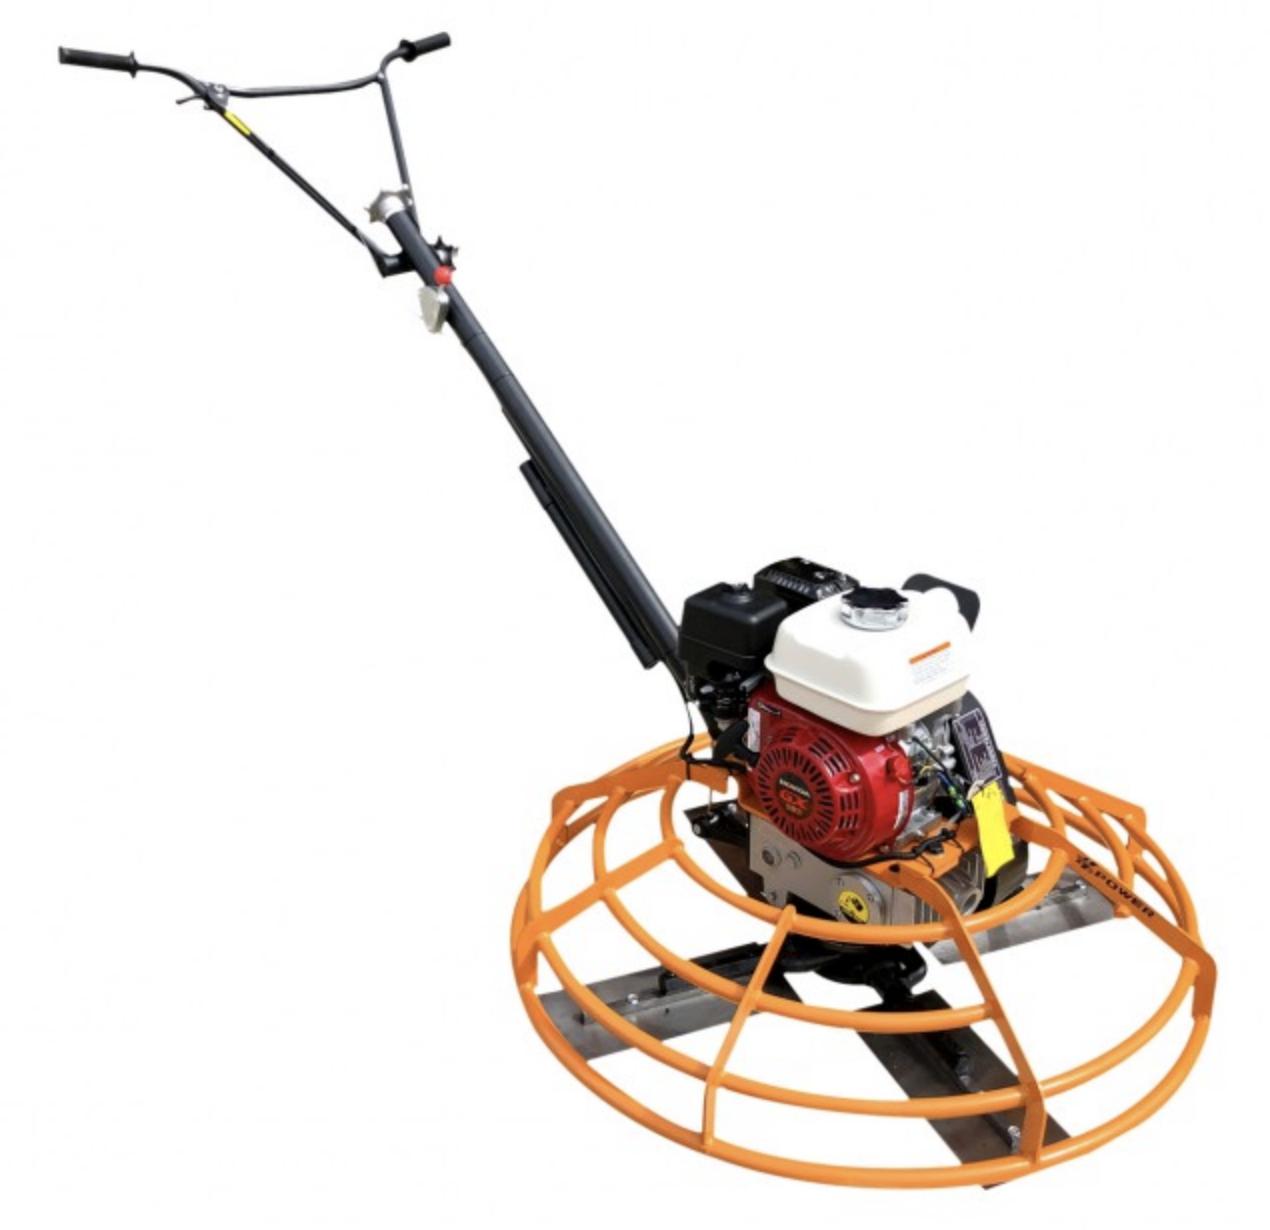 joper-36-allanadora-de-concreto-sencilla-36-concreto-helicoptero